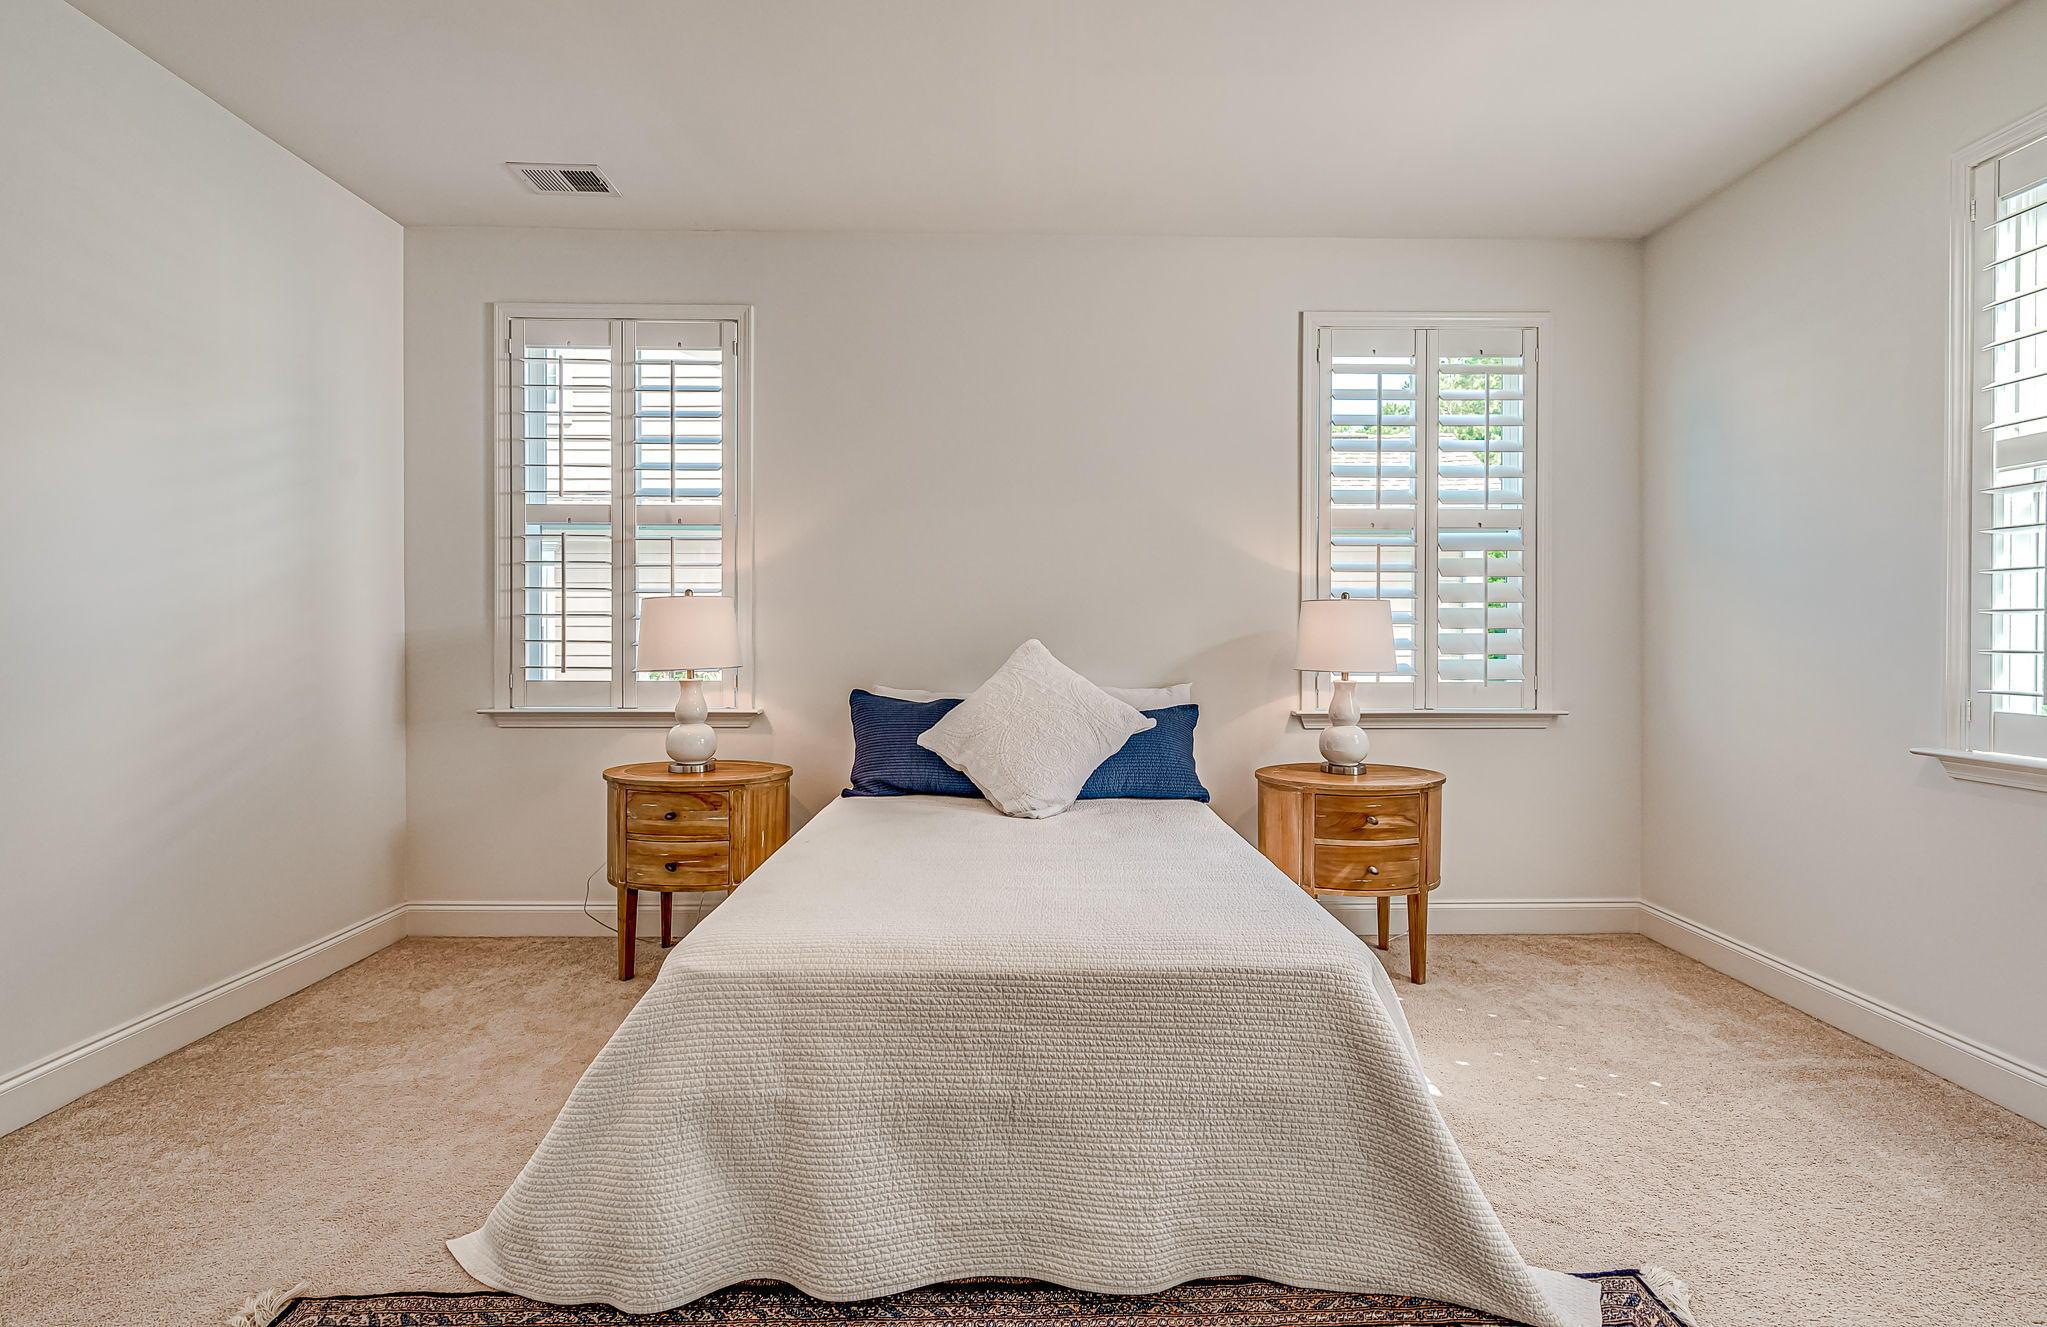 Dunes West Homes For Sale - 2476 Kings Gate, Mount Pleasant, SC - 20